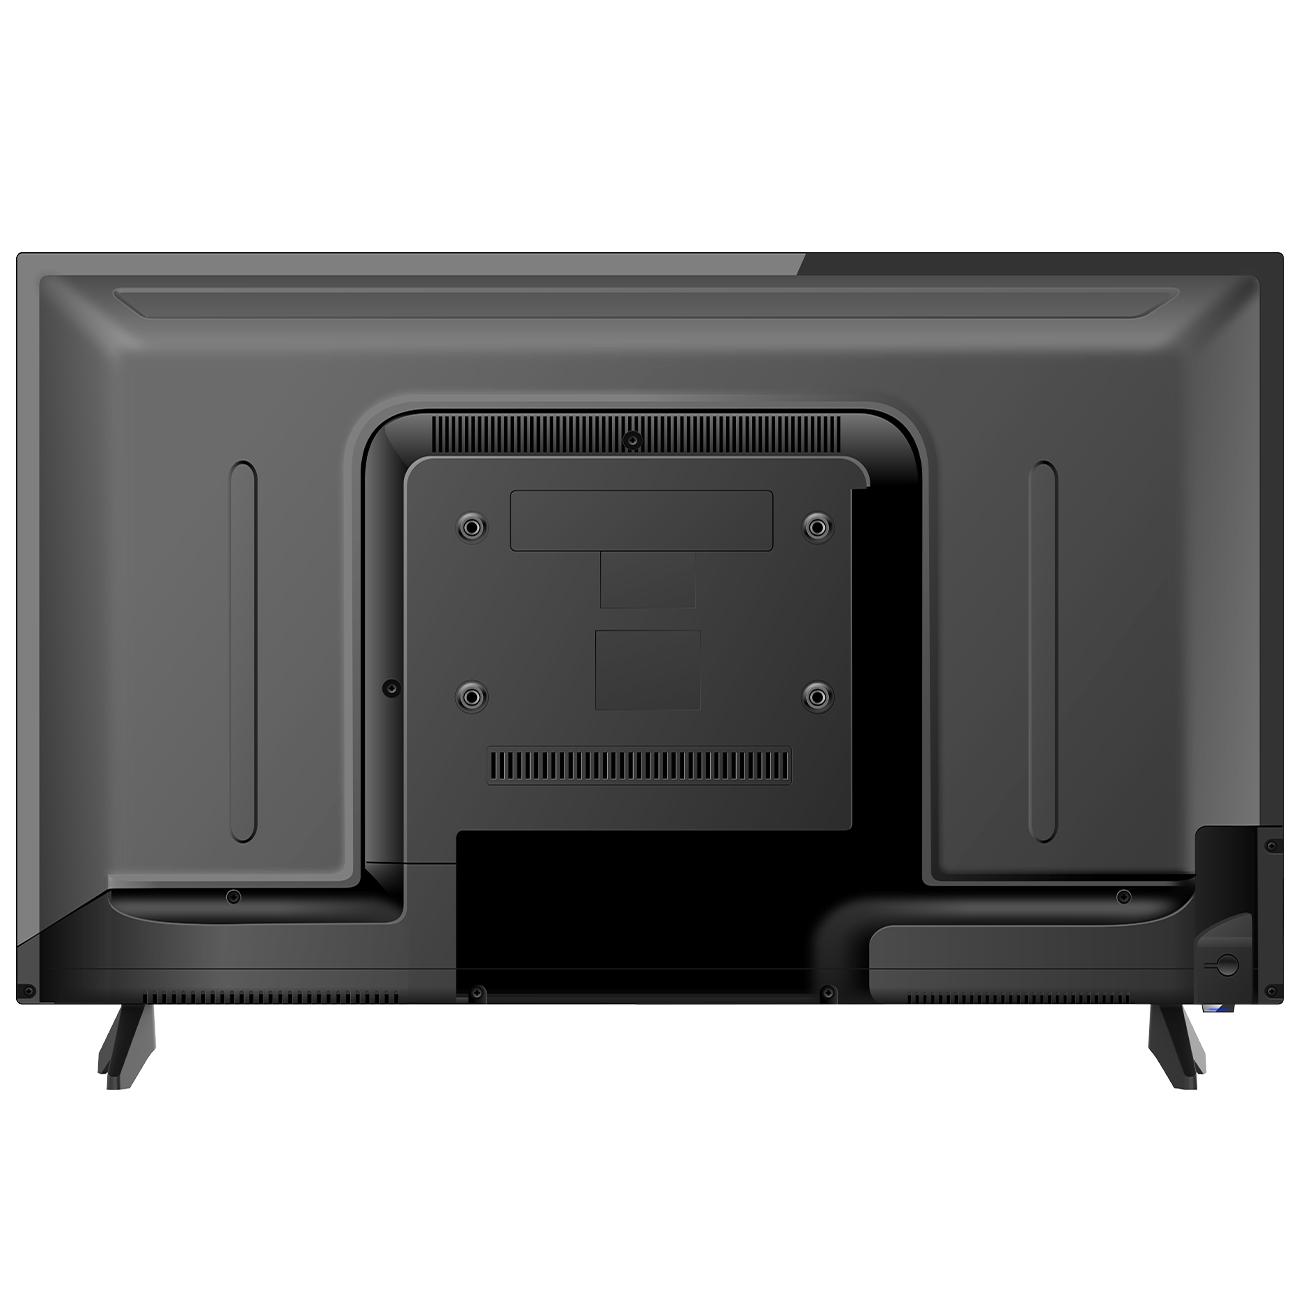 Телевизор Blackton 32S01B